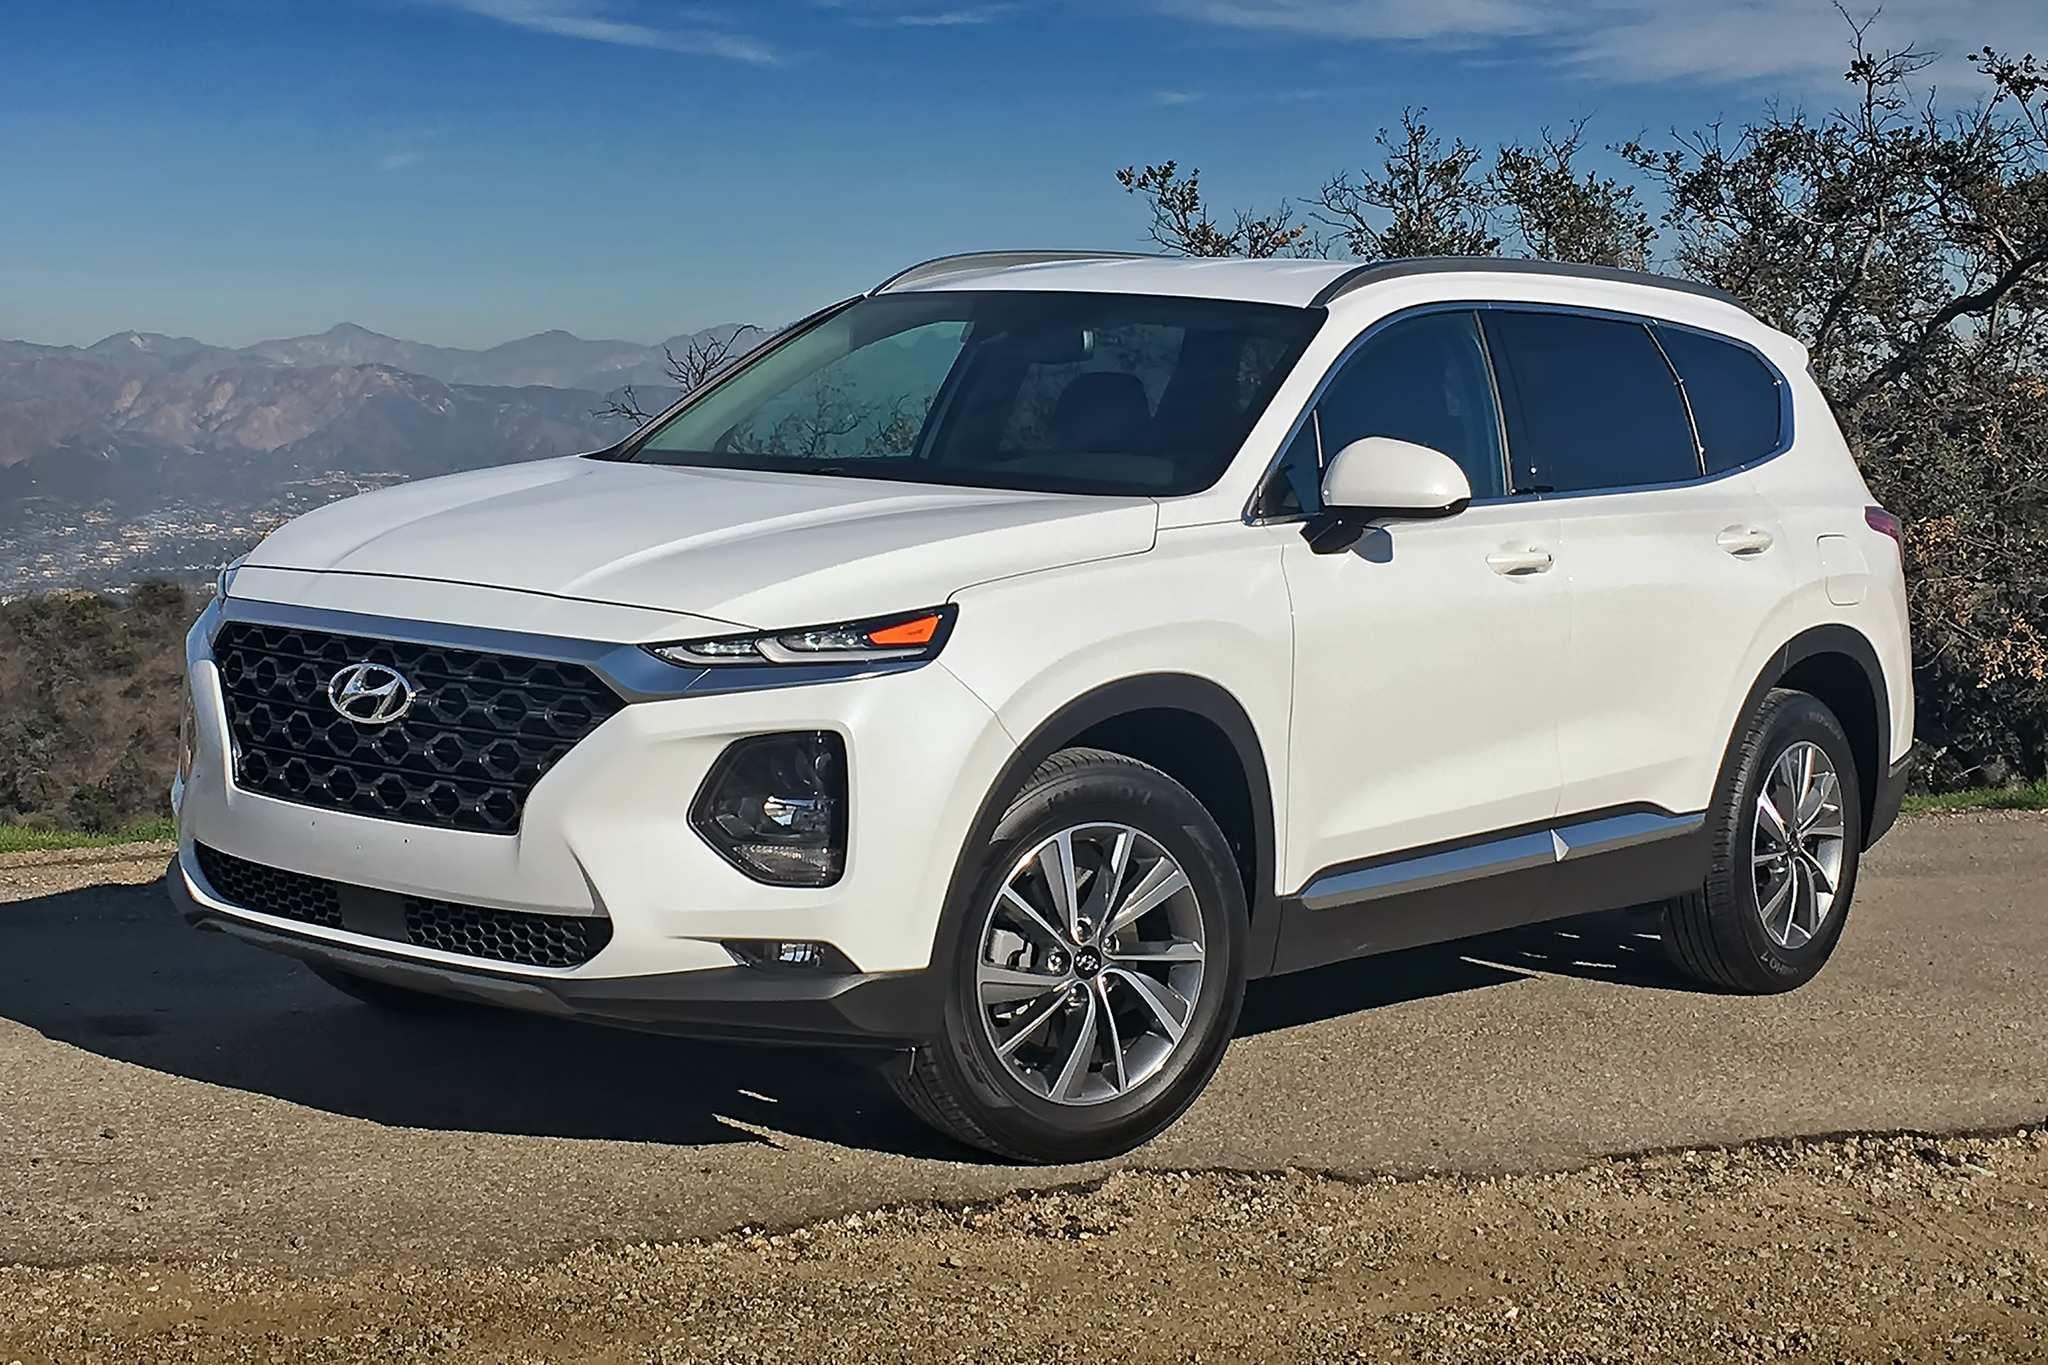 28 New Hyundai Santa Fe 2020 Prices with Hyundai Santa Fe 2020